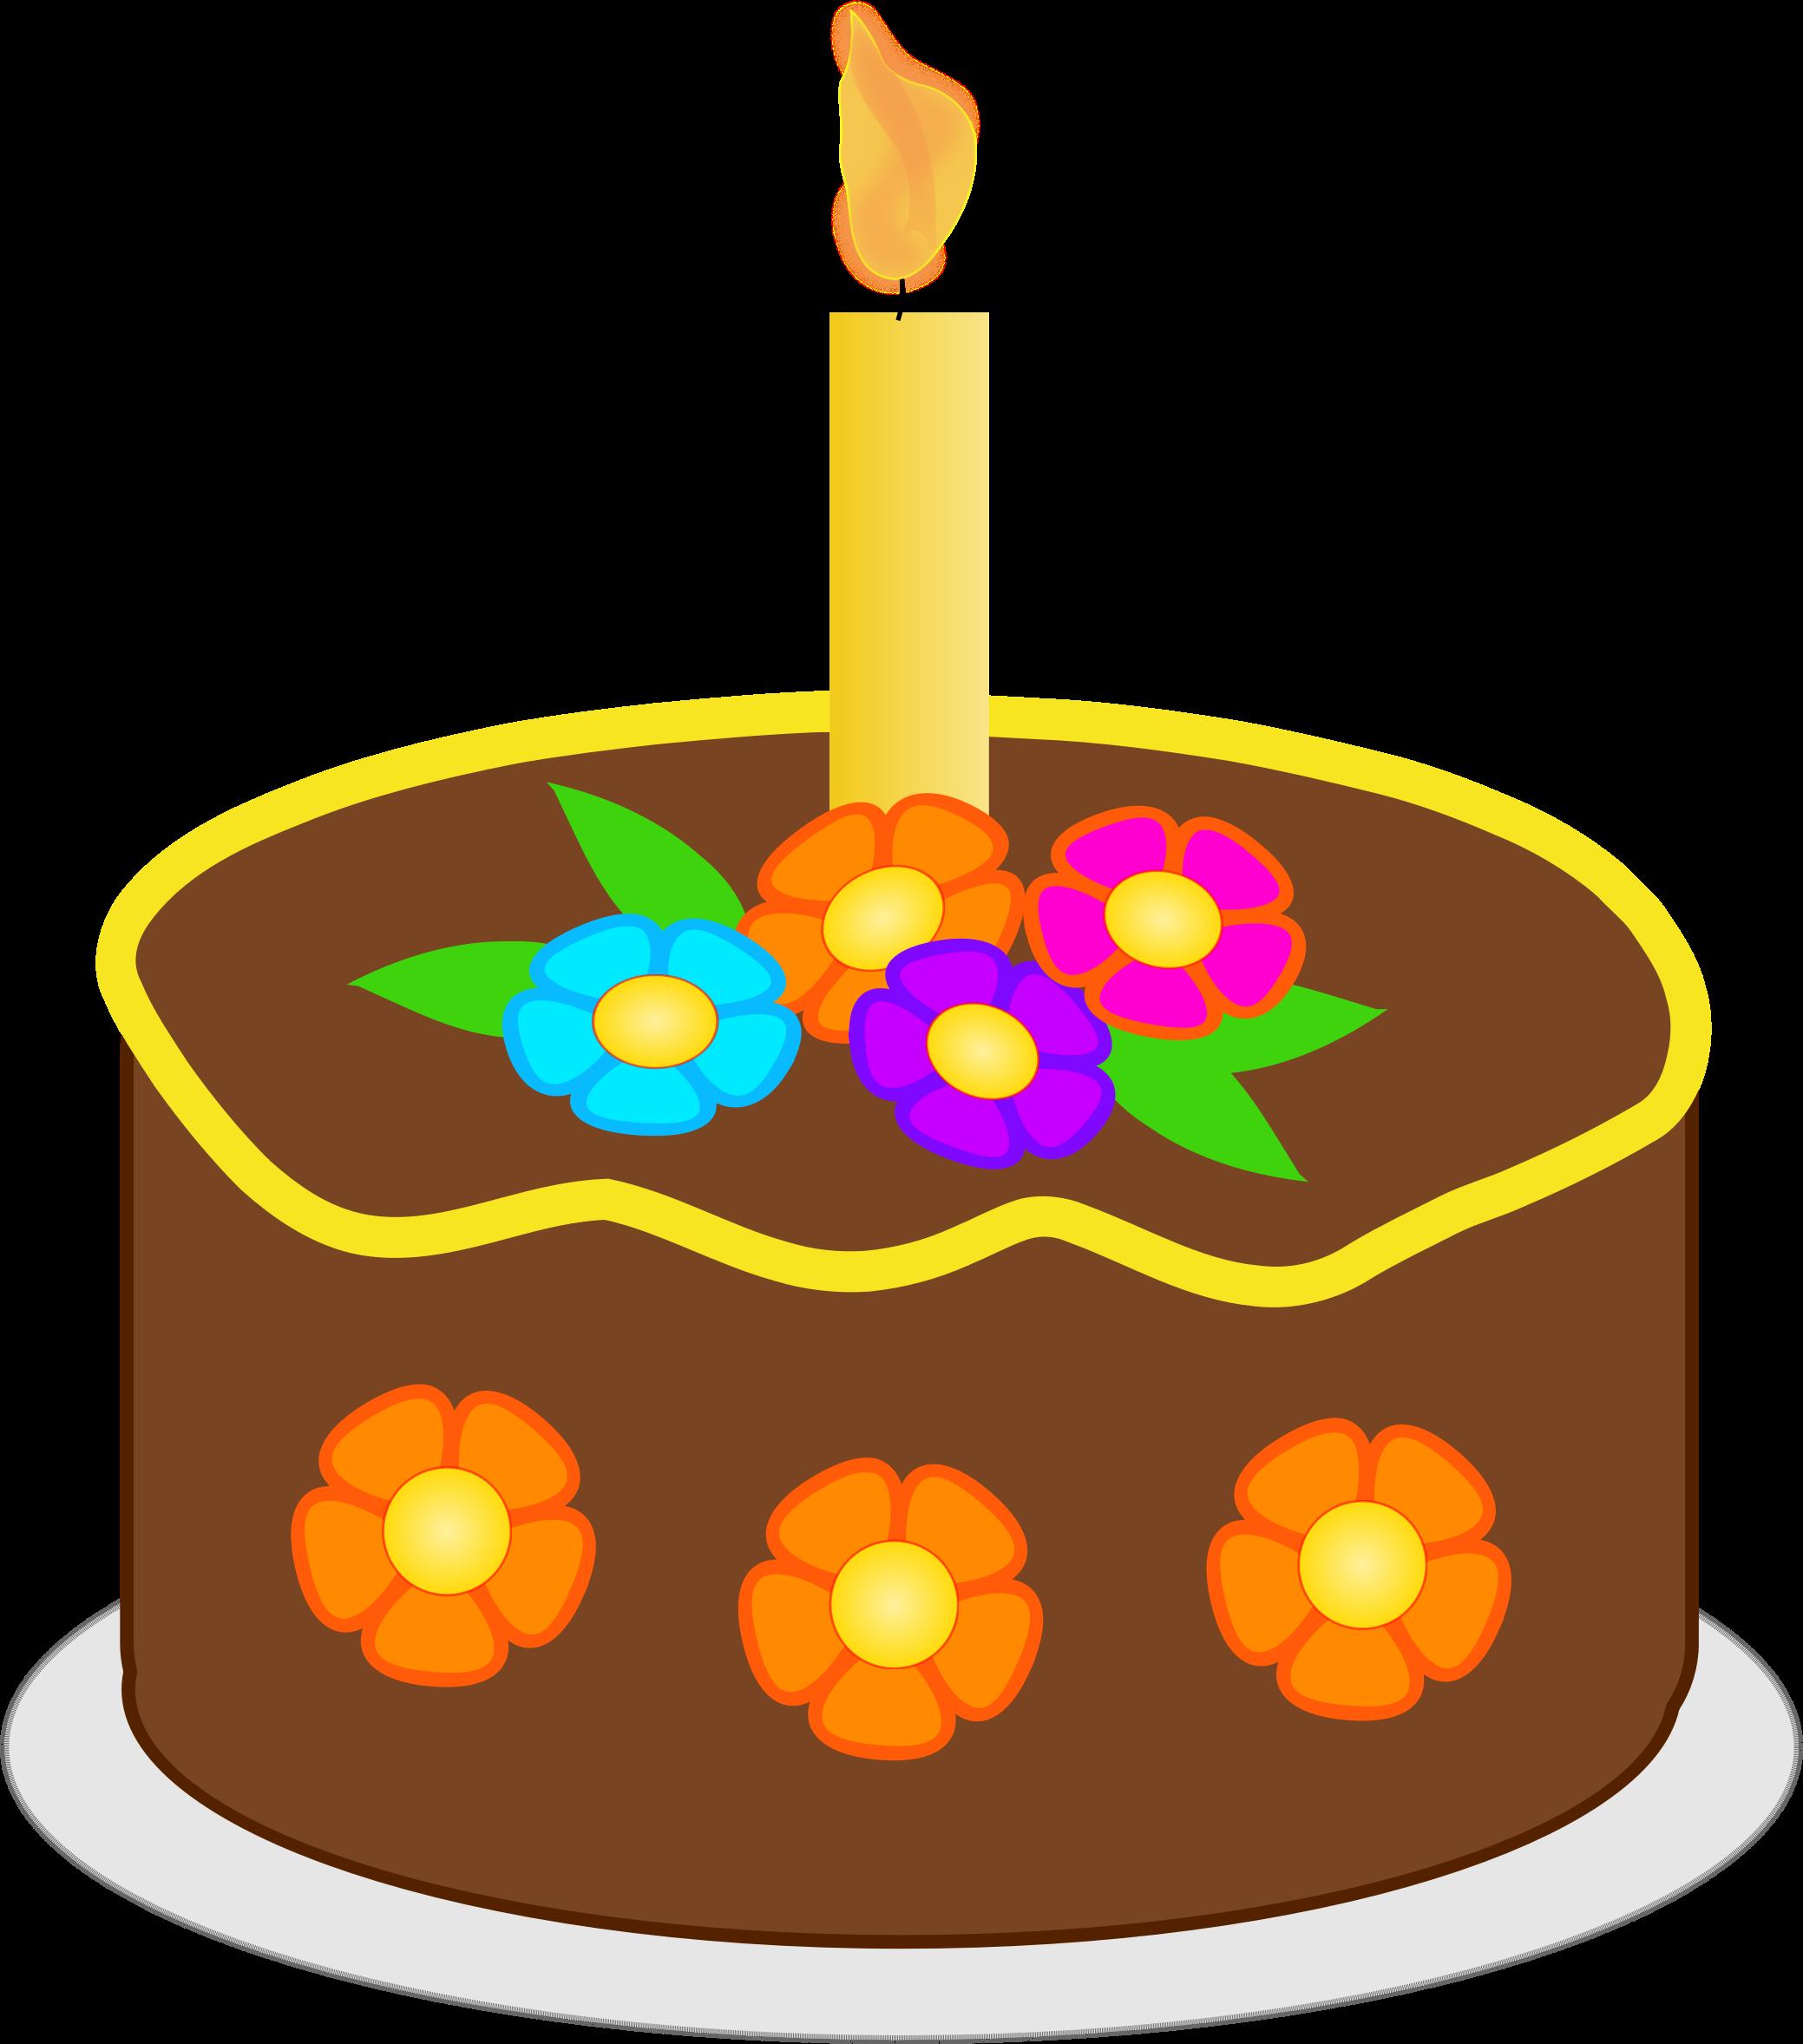 2078x2356 Falling Clipart Birthday Cake